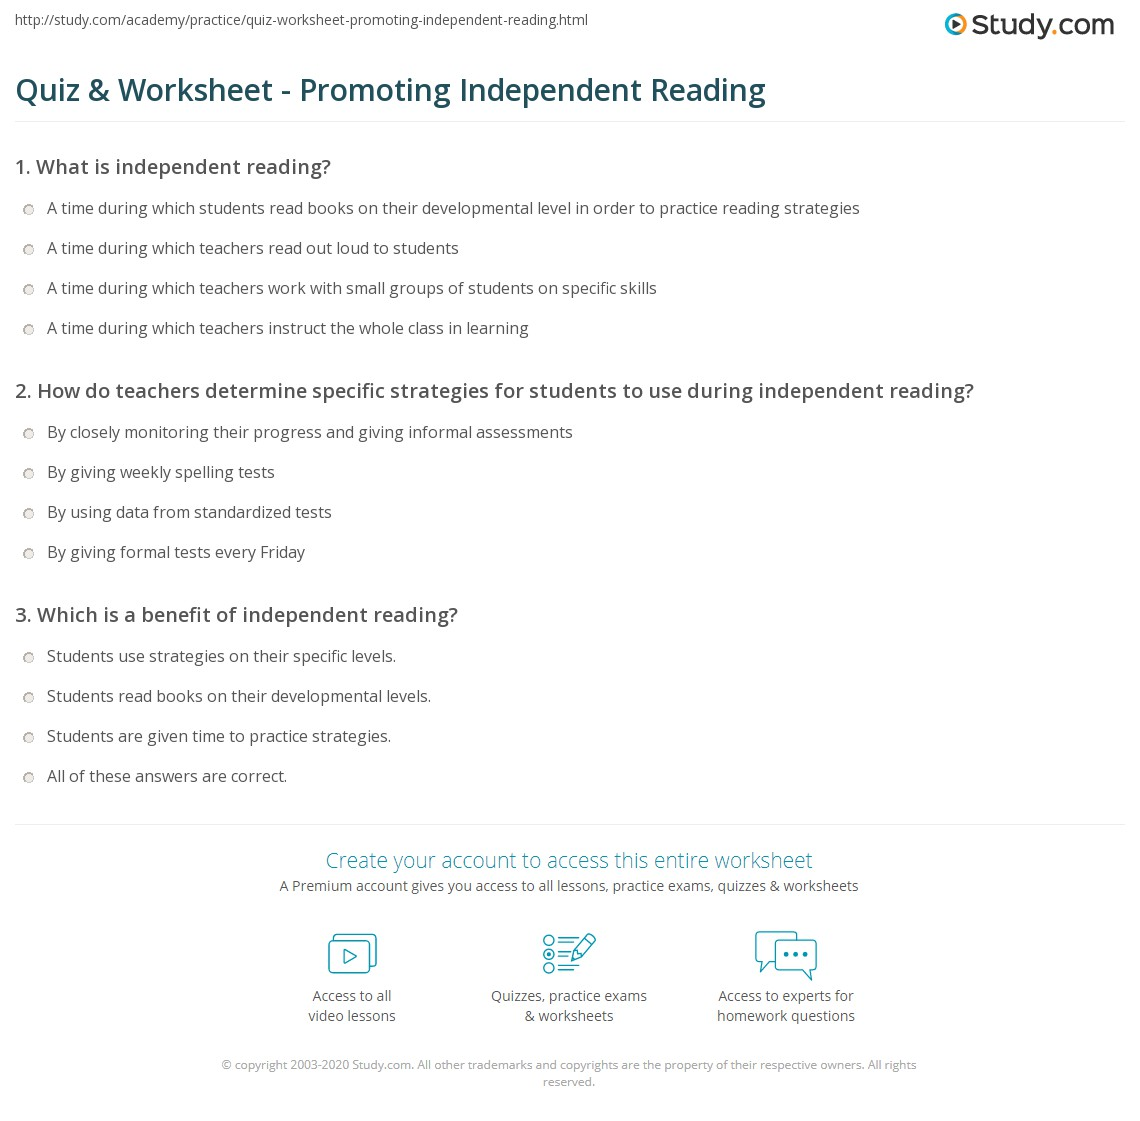 Worksheets Independent Reading Worksheets quiz worksheet promoting independent reading study com print the importance of for developing comprehension worksheet